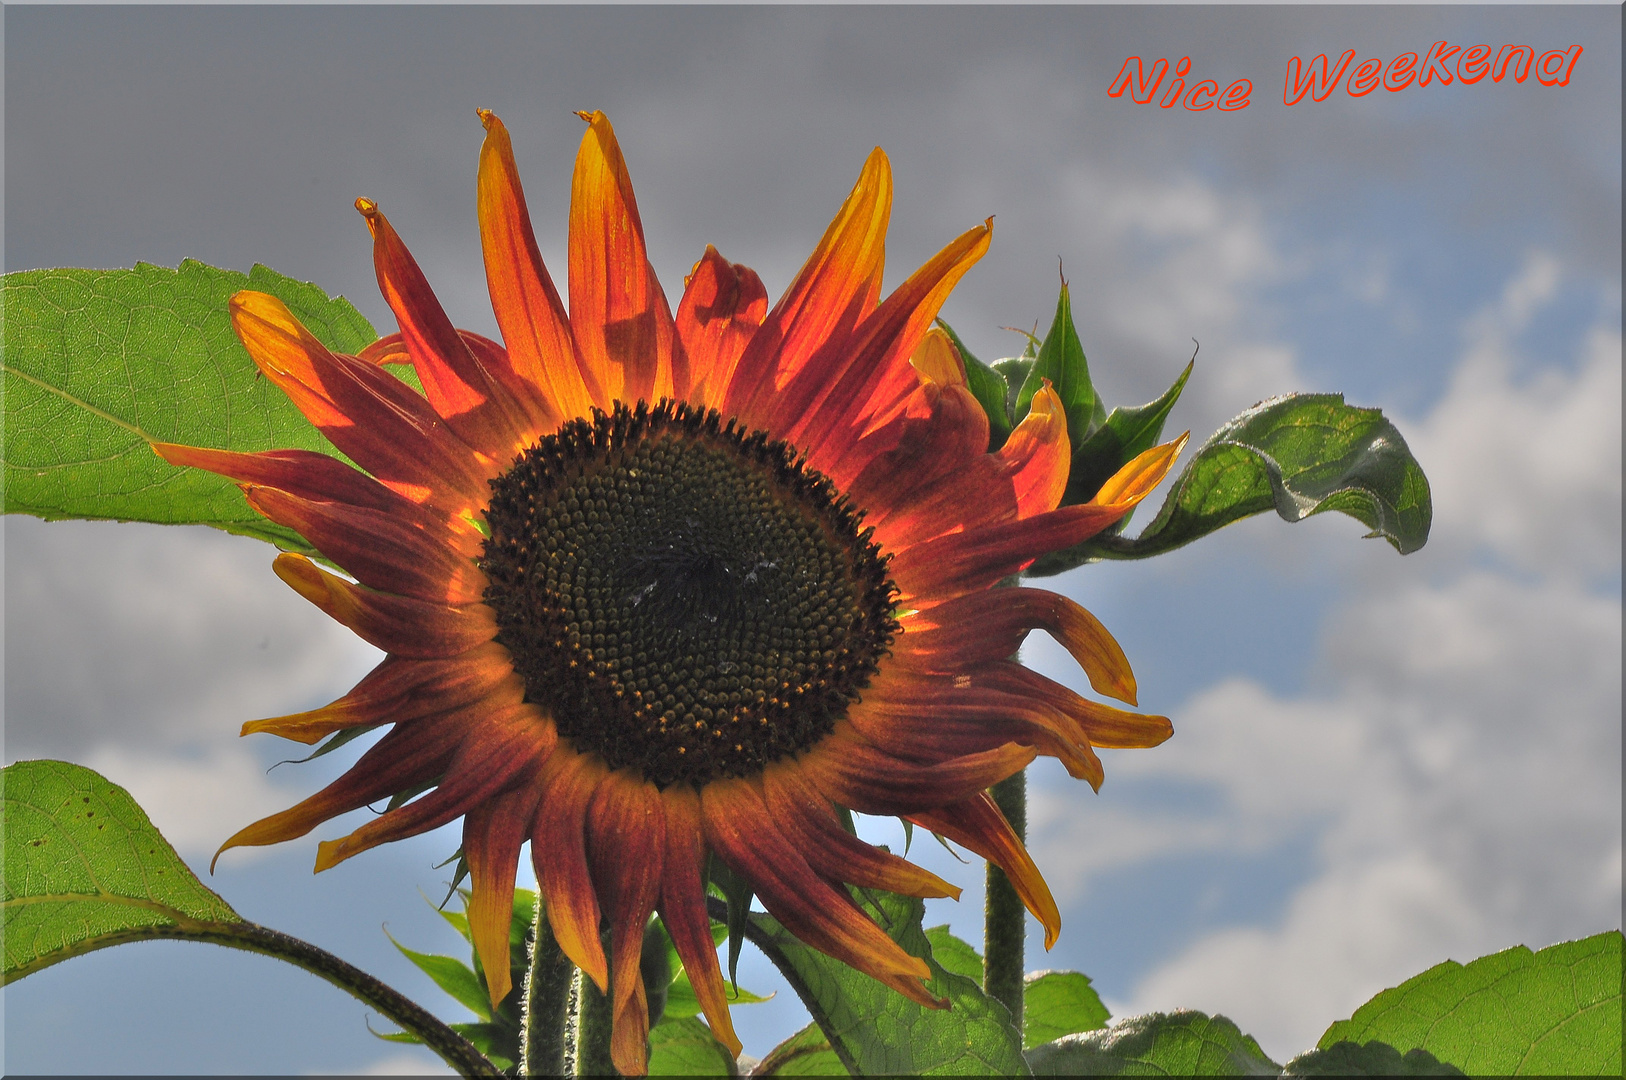 Herbst - Sonne